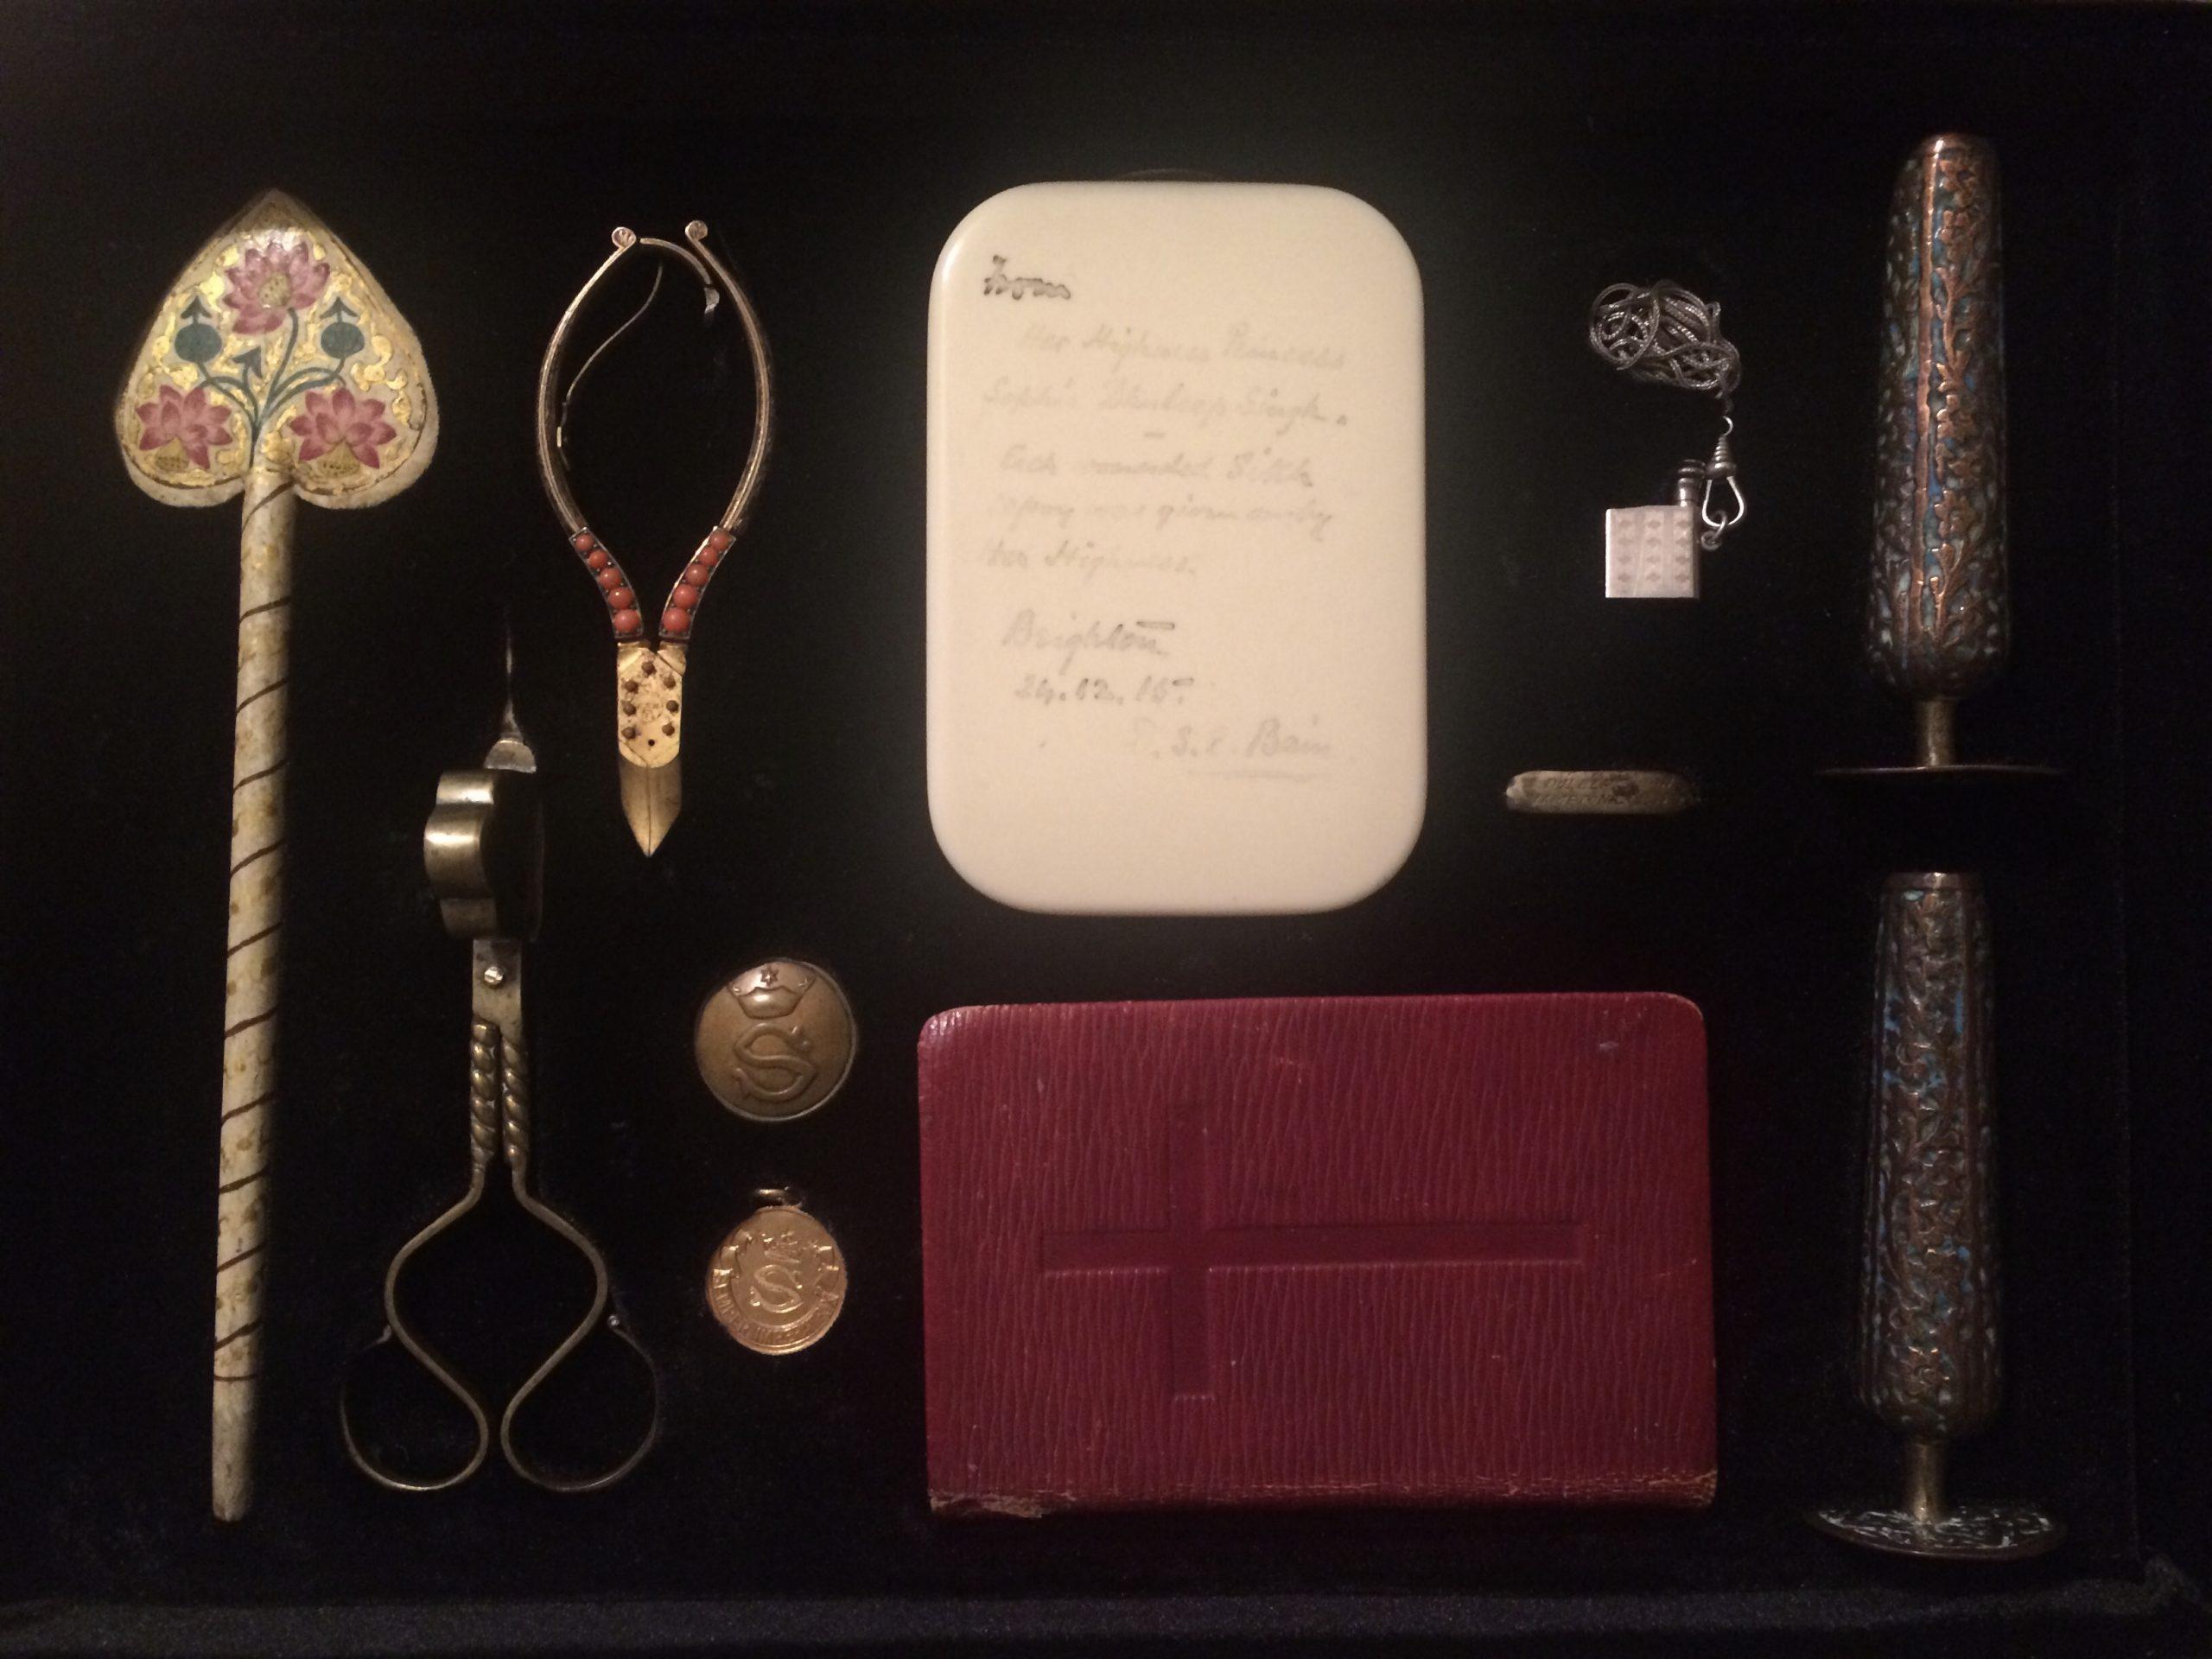 Personal belongings of Princess Sophia